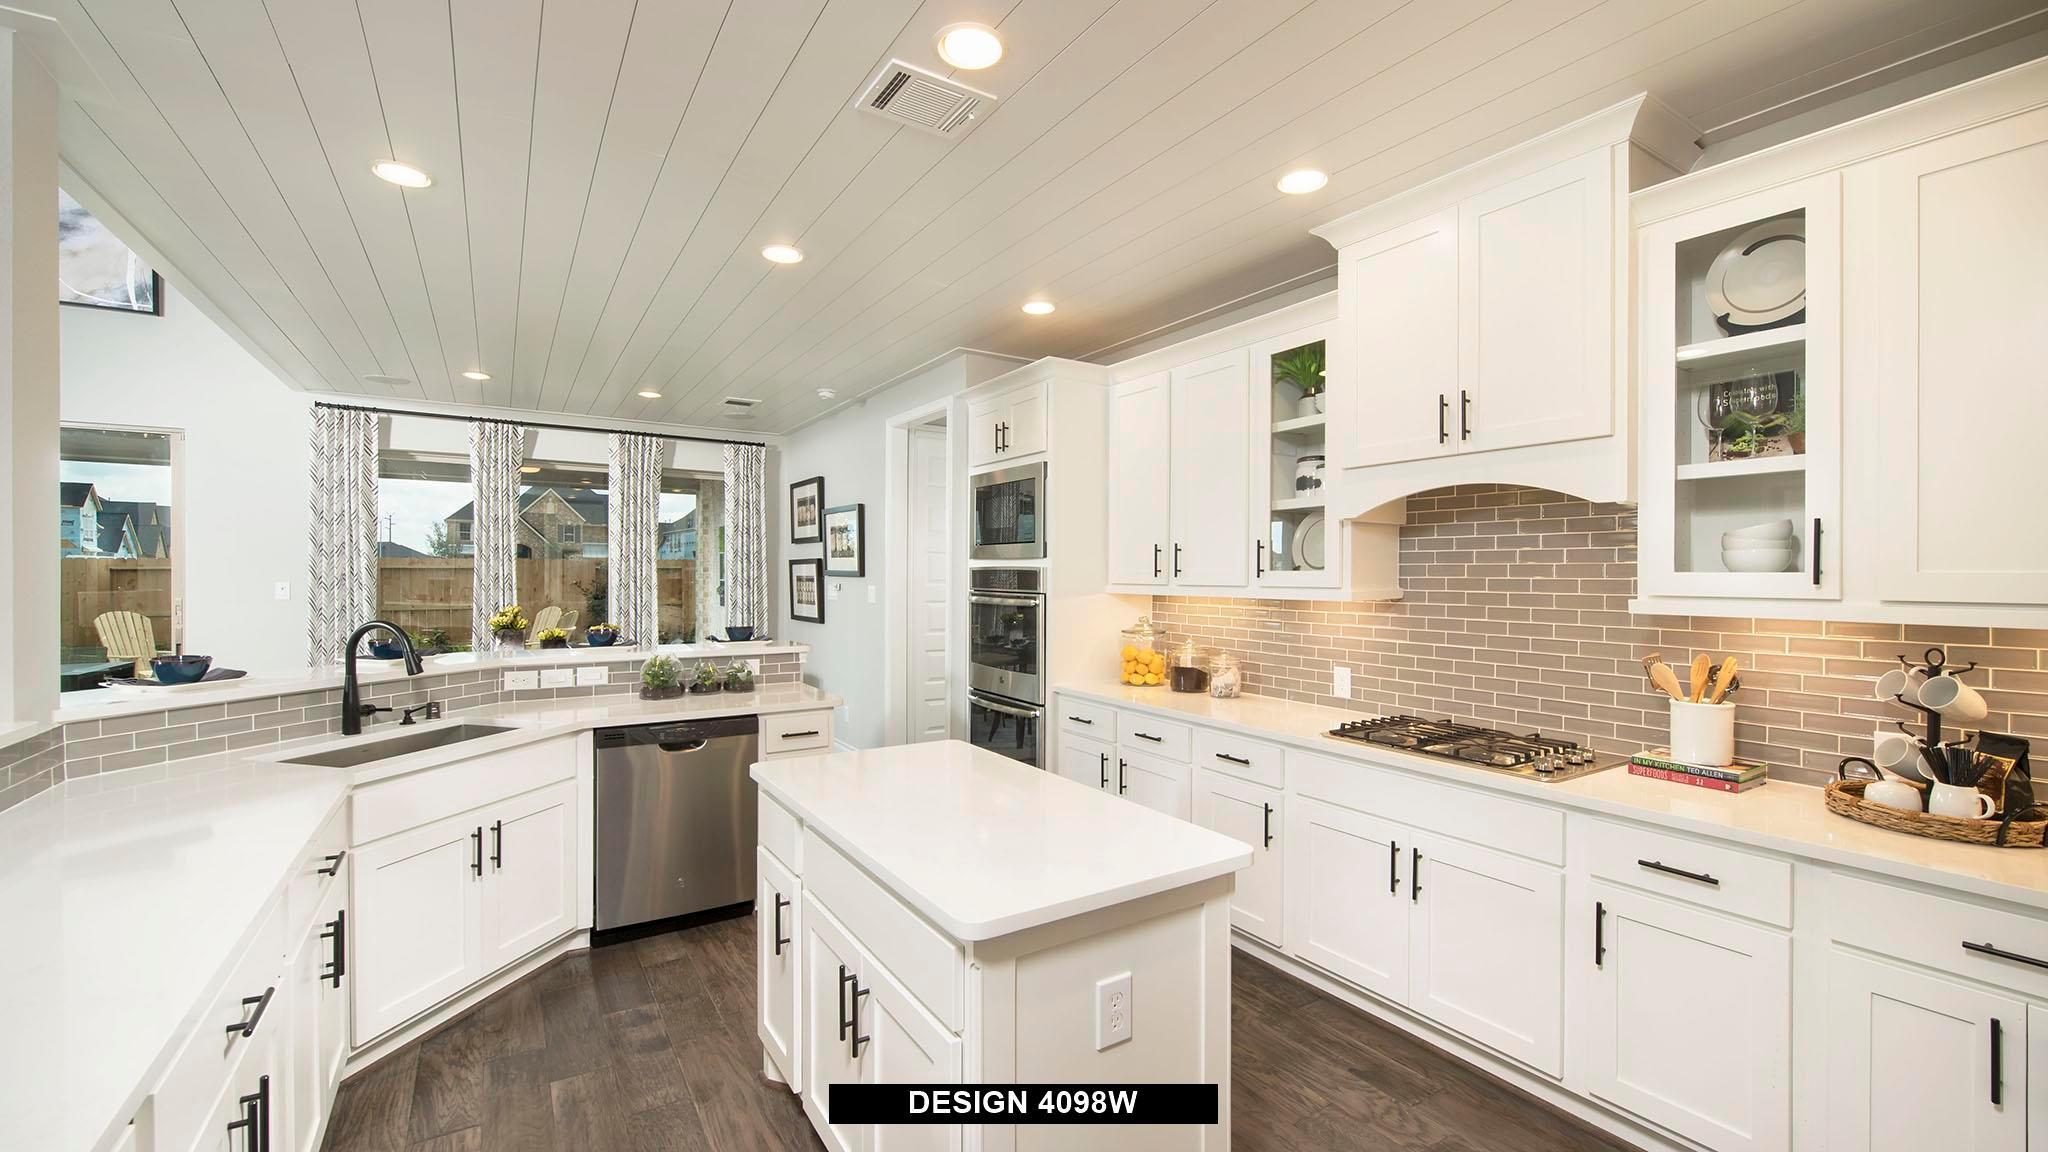 Kitchen-in-4098W-at-Fulbrook on Fulshear Creek 80'-in-Fulshear